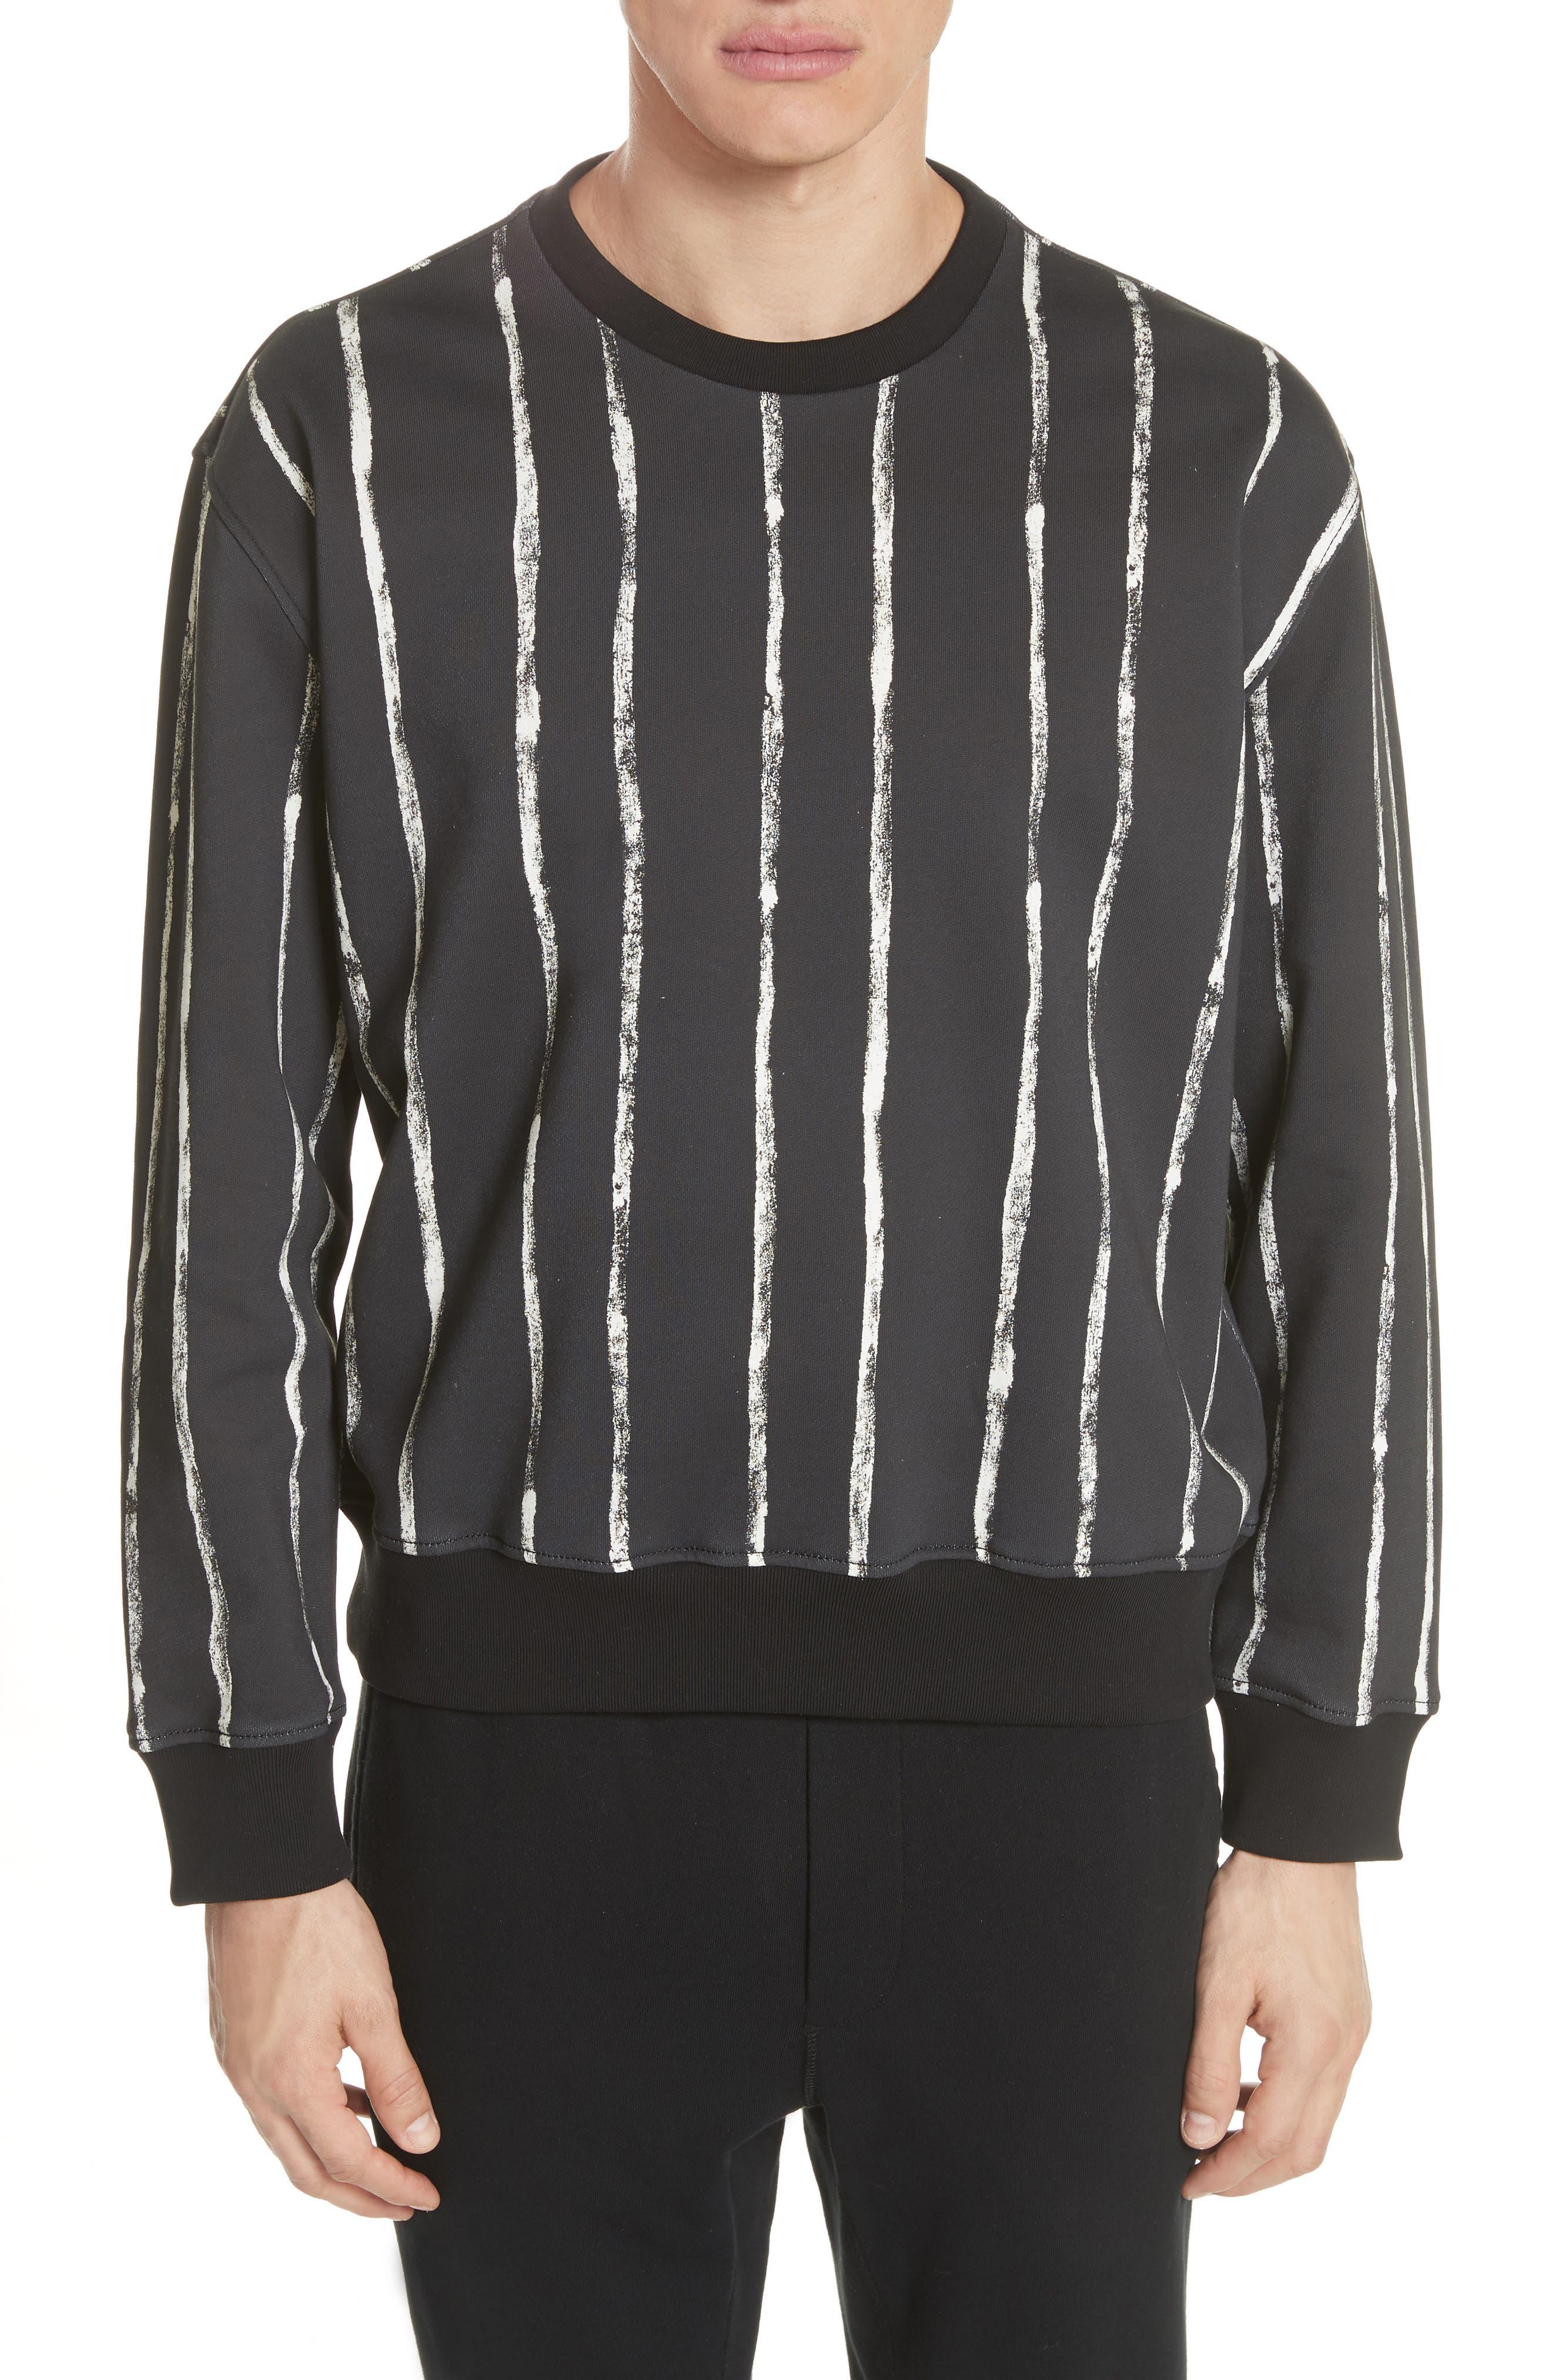 3.1 Phillip Lim Paint Stripe Crewneck Sweatshirt